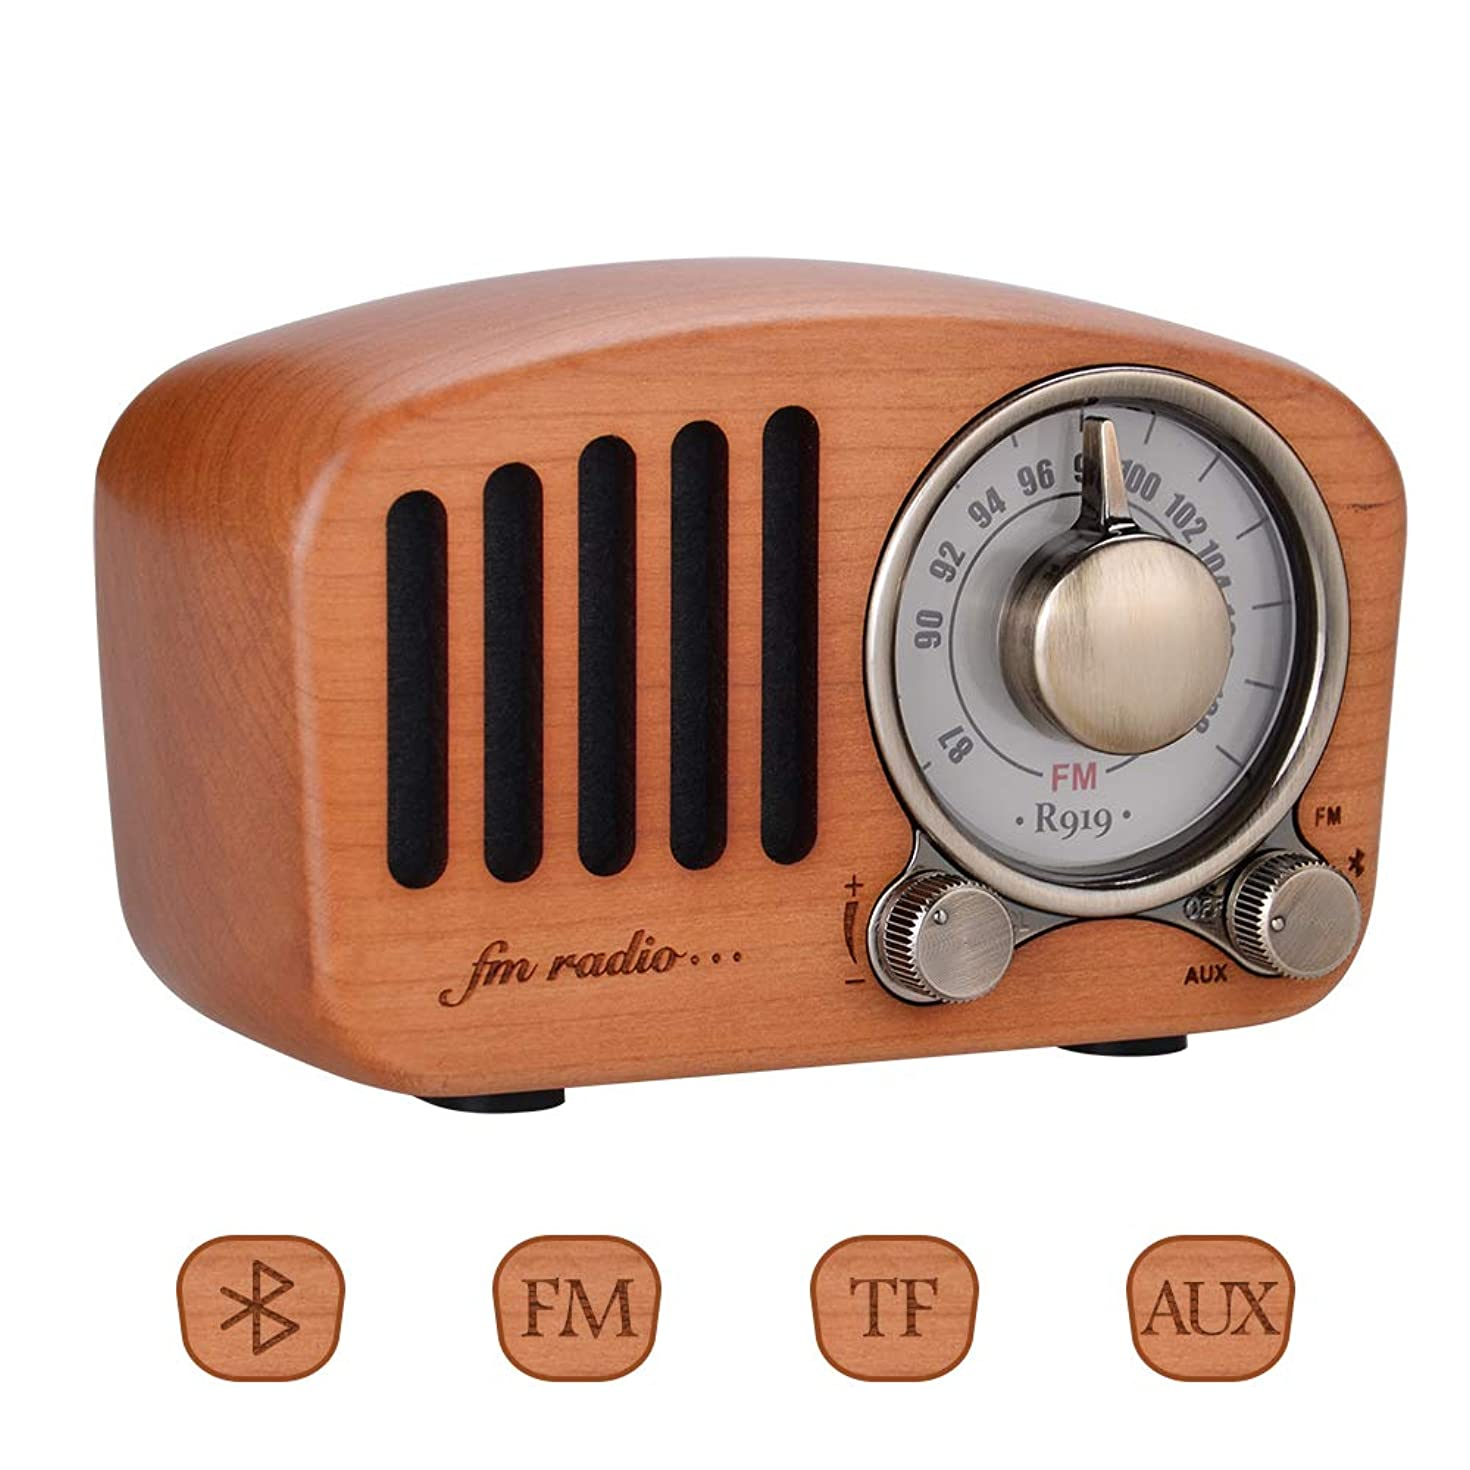 Qoosea Retro Radio Portable Radio FM Radio with Bluetooth Speaker Vintage Radio Handmade Retro Mahogany with Stereo Sound Bluetooth Mini Speaker 3.5mm Audio Input Jack and TF Card Ports